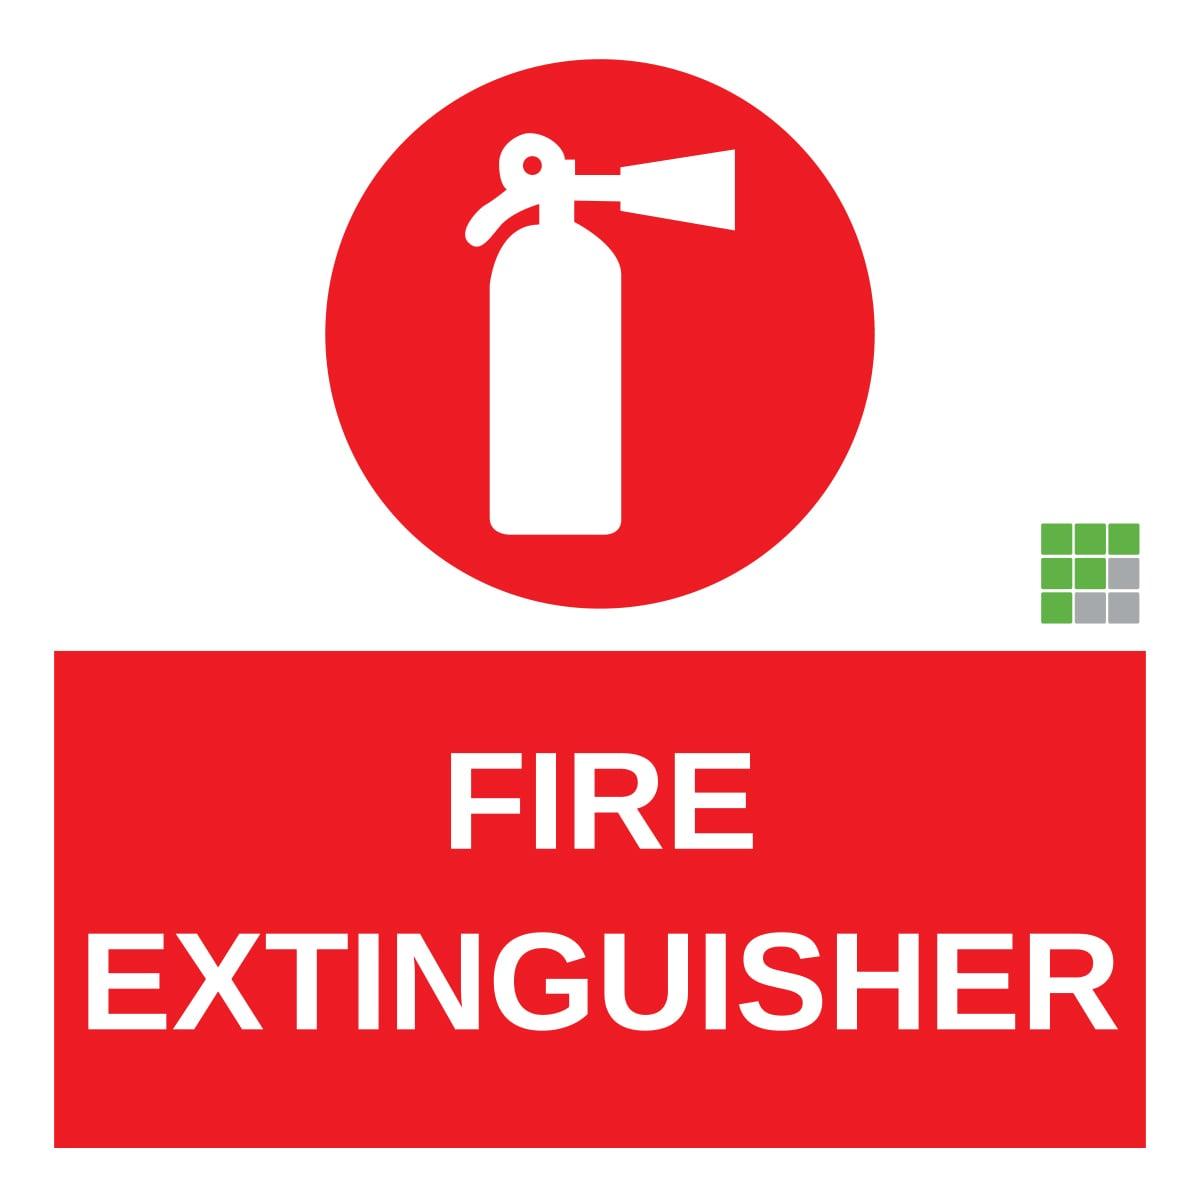 fire extinguisher - 1x1ft.jpg